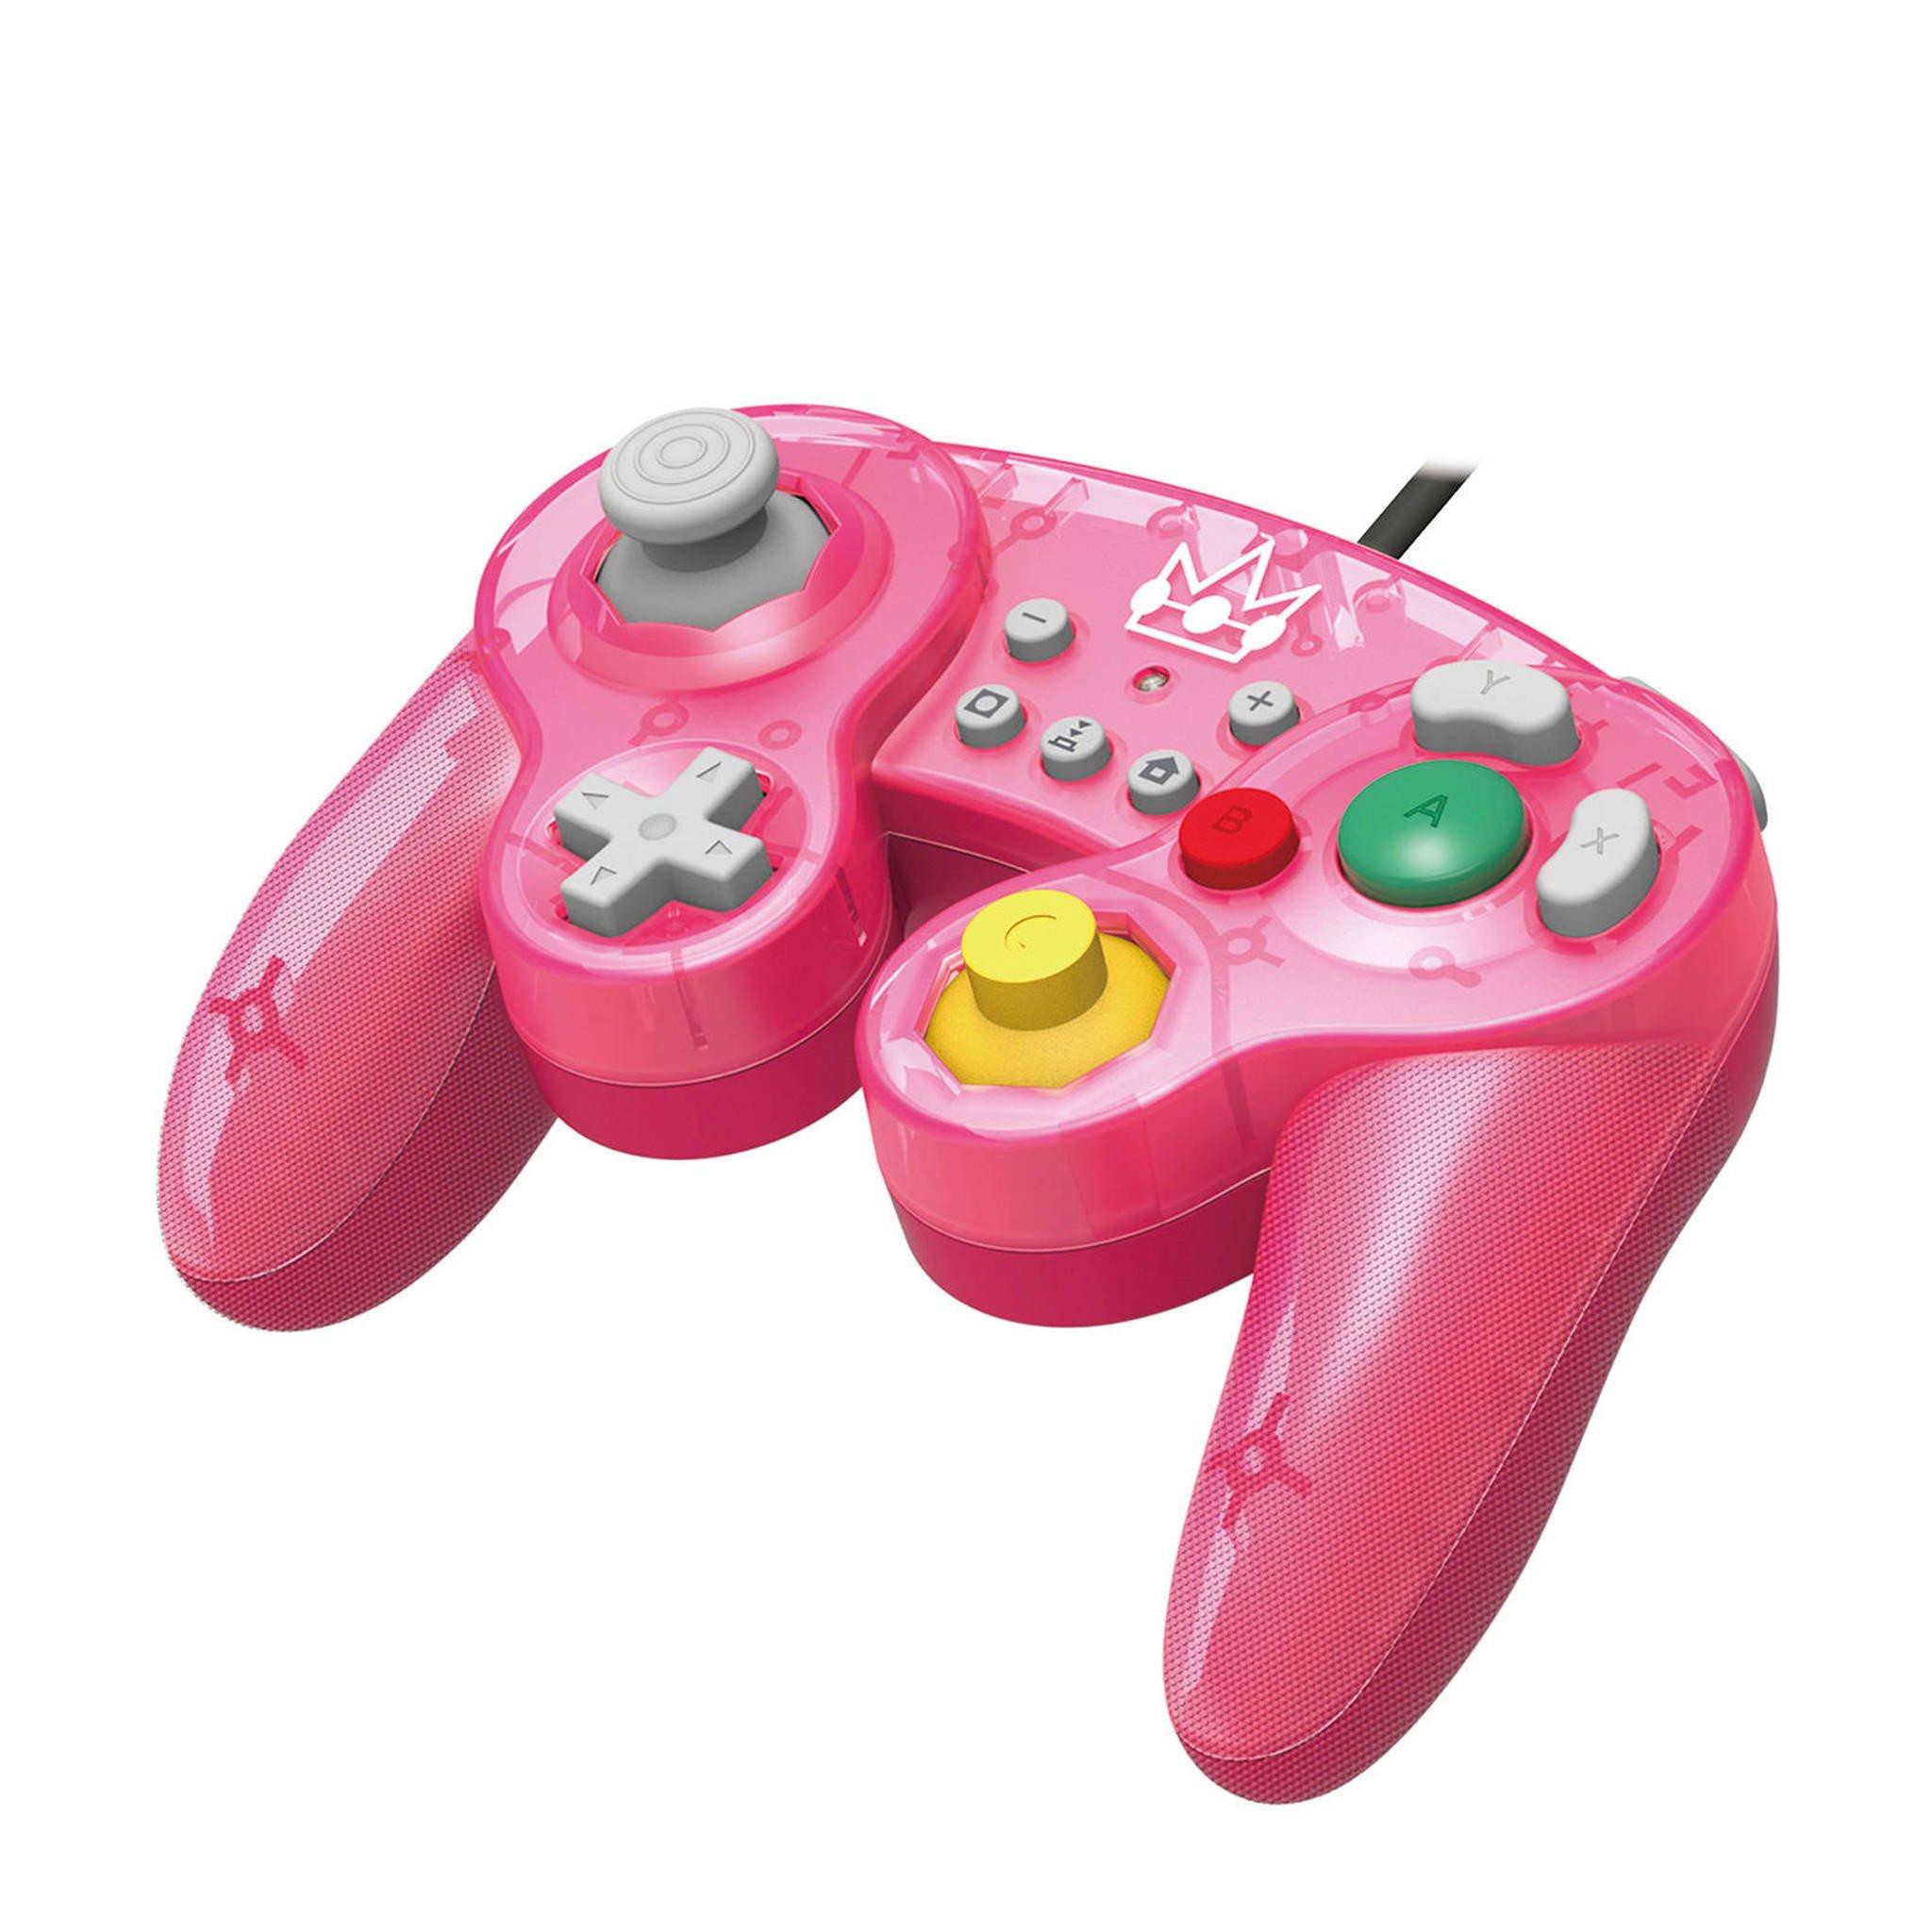 Nintendo Switch Controller - Hori - Smash Bros Gamepad Peach @ Wehkamp